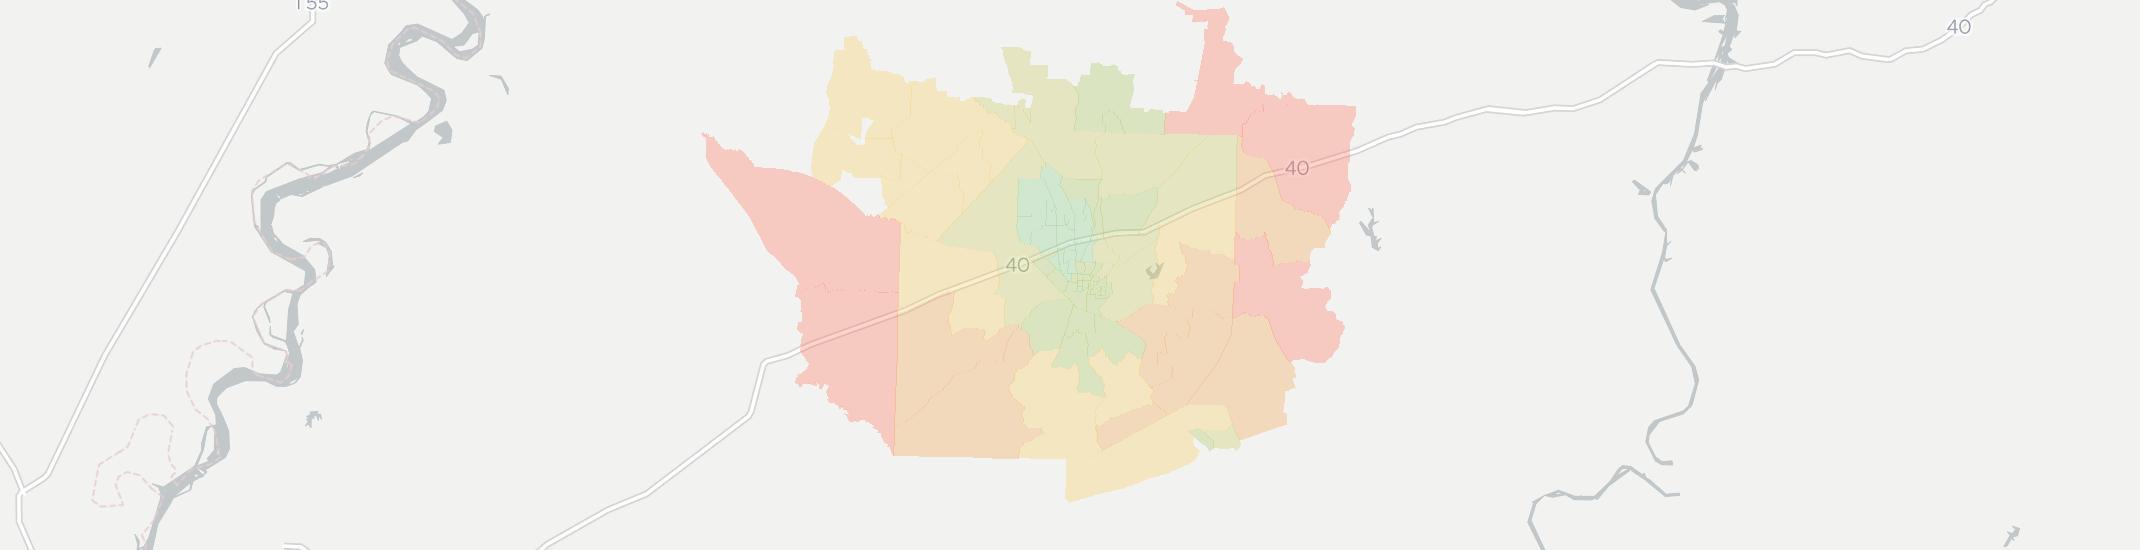 Jackson Tn Zip Code Map.Internet Providers In Jackson Tn Compare 15 Providers